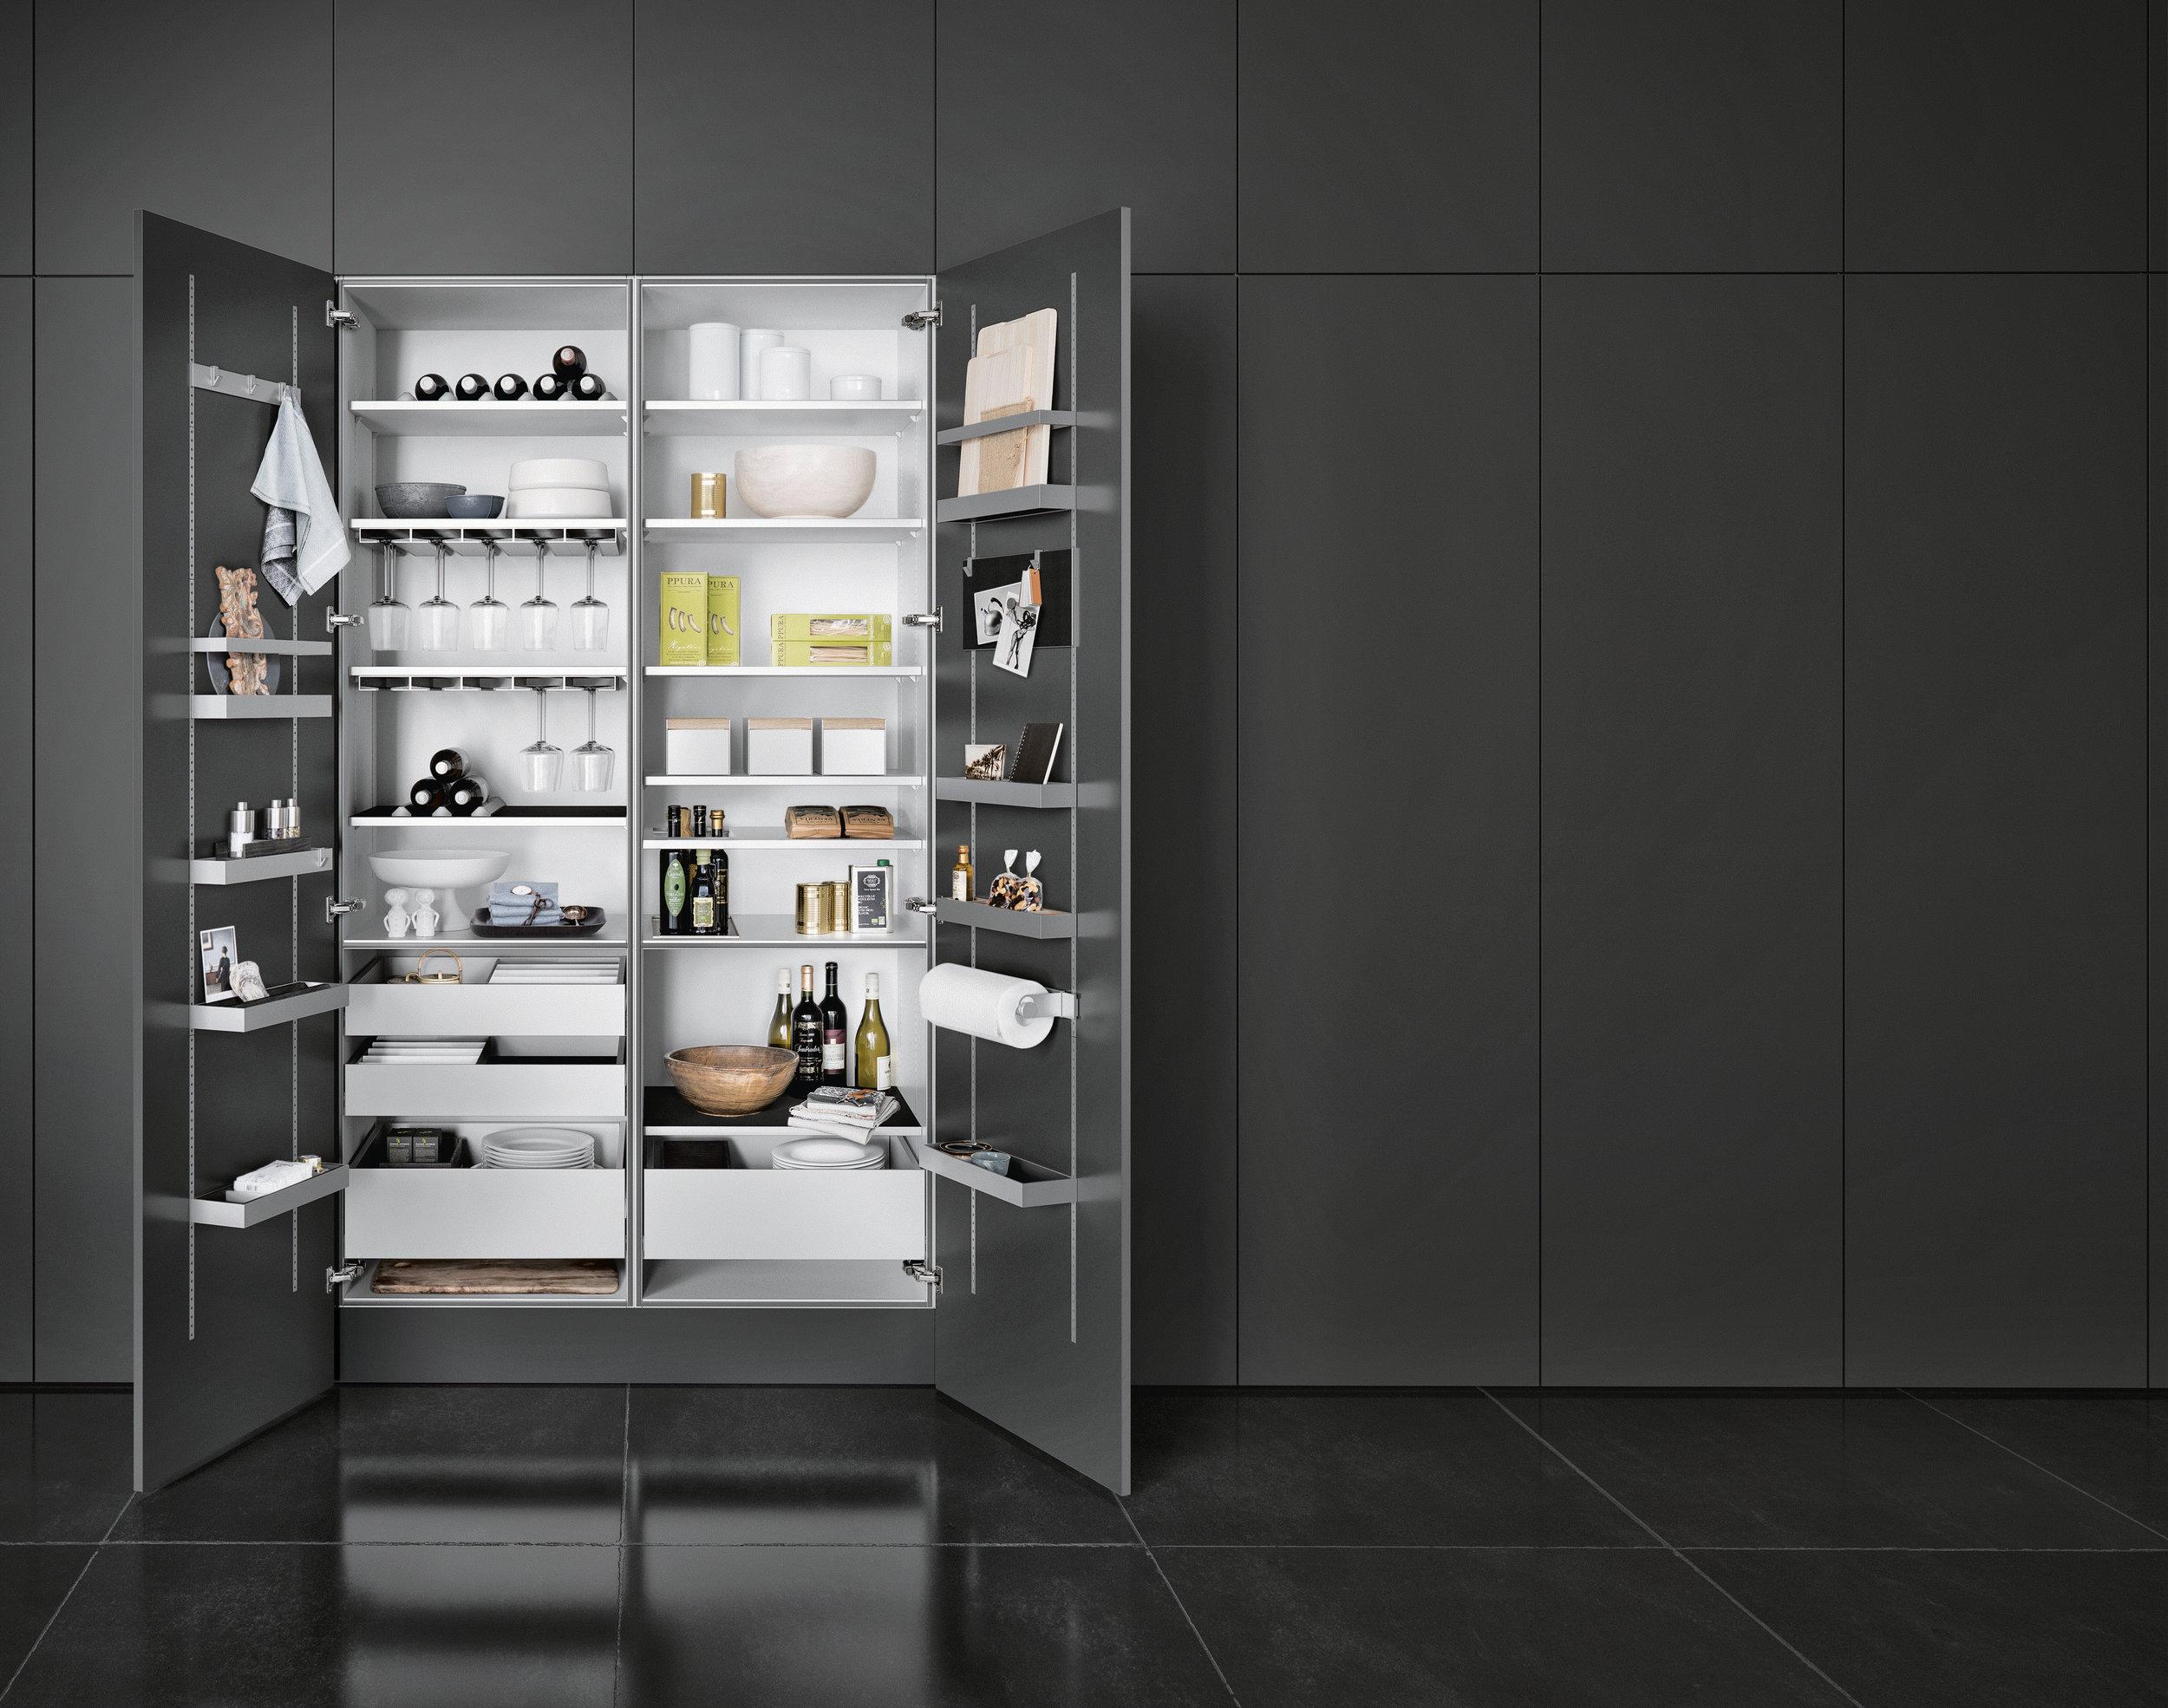 SieMatic Refrigerator